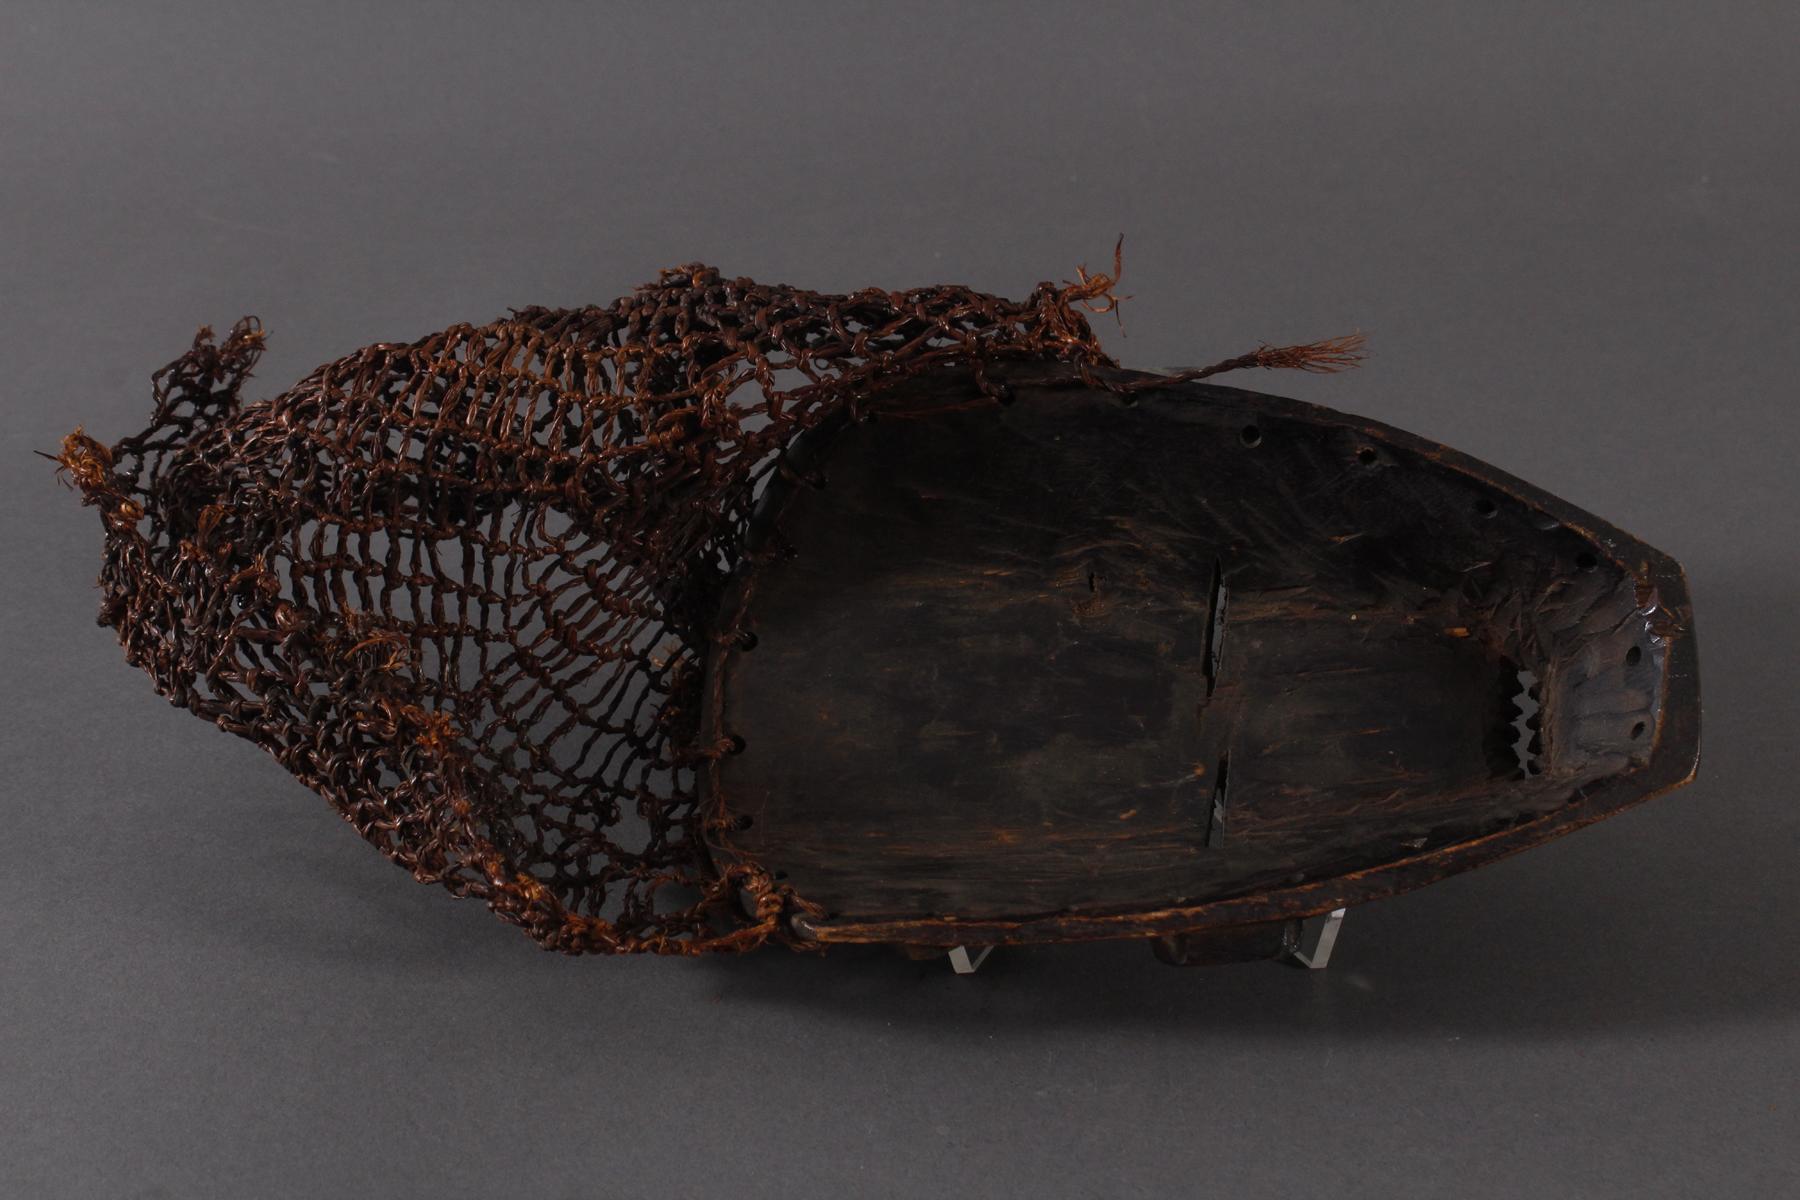 Antike Maske, Chokwe, Kongo 1.Hälfte 20. Jh.Holz geschnitzt, dunkle Patina, Narbenschmuck, - Bild 4 aus 4